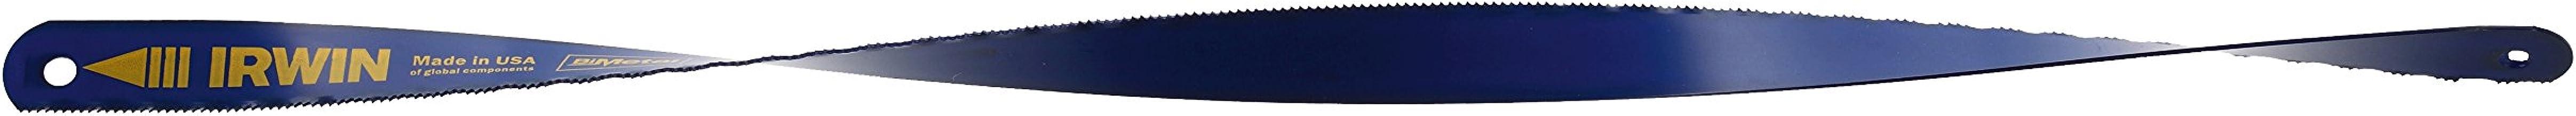 IRWIN 10504530 - Hoja para madera Junior 14 TPI, 6 pulgadas/150 mm, 10 uds.